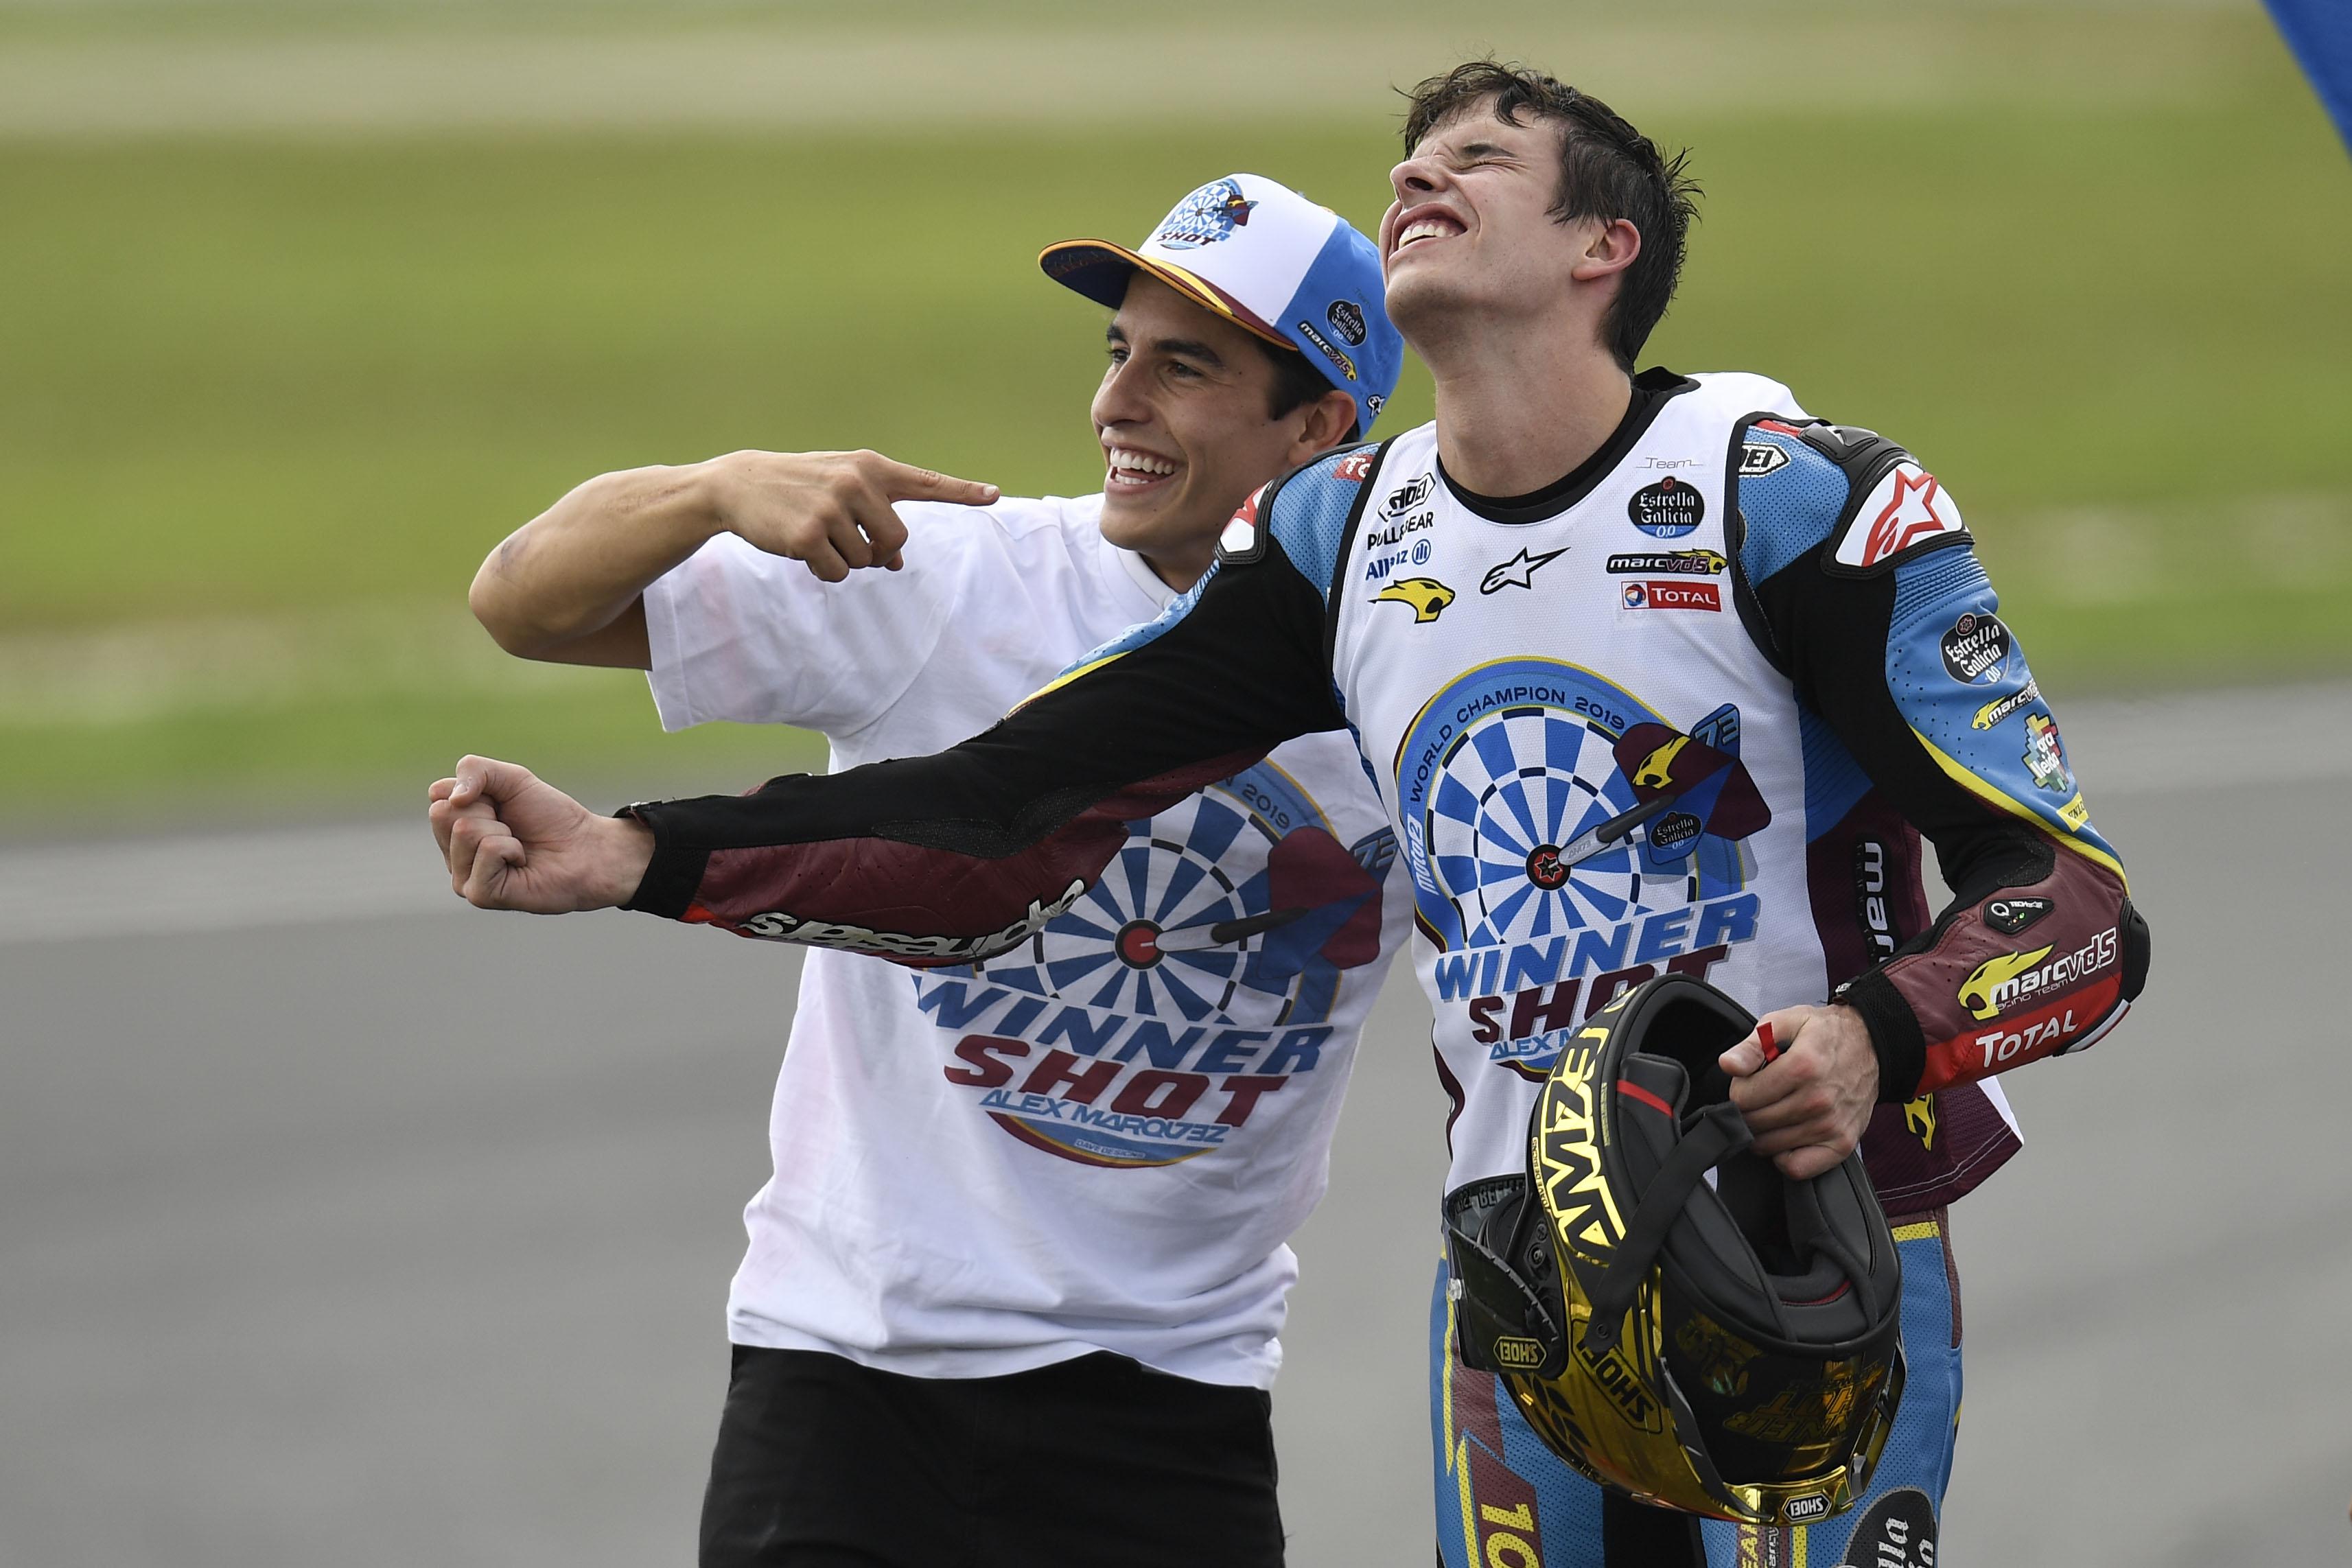 Marc and Alex Marquez